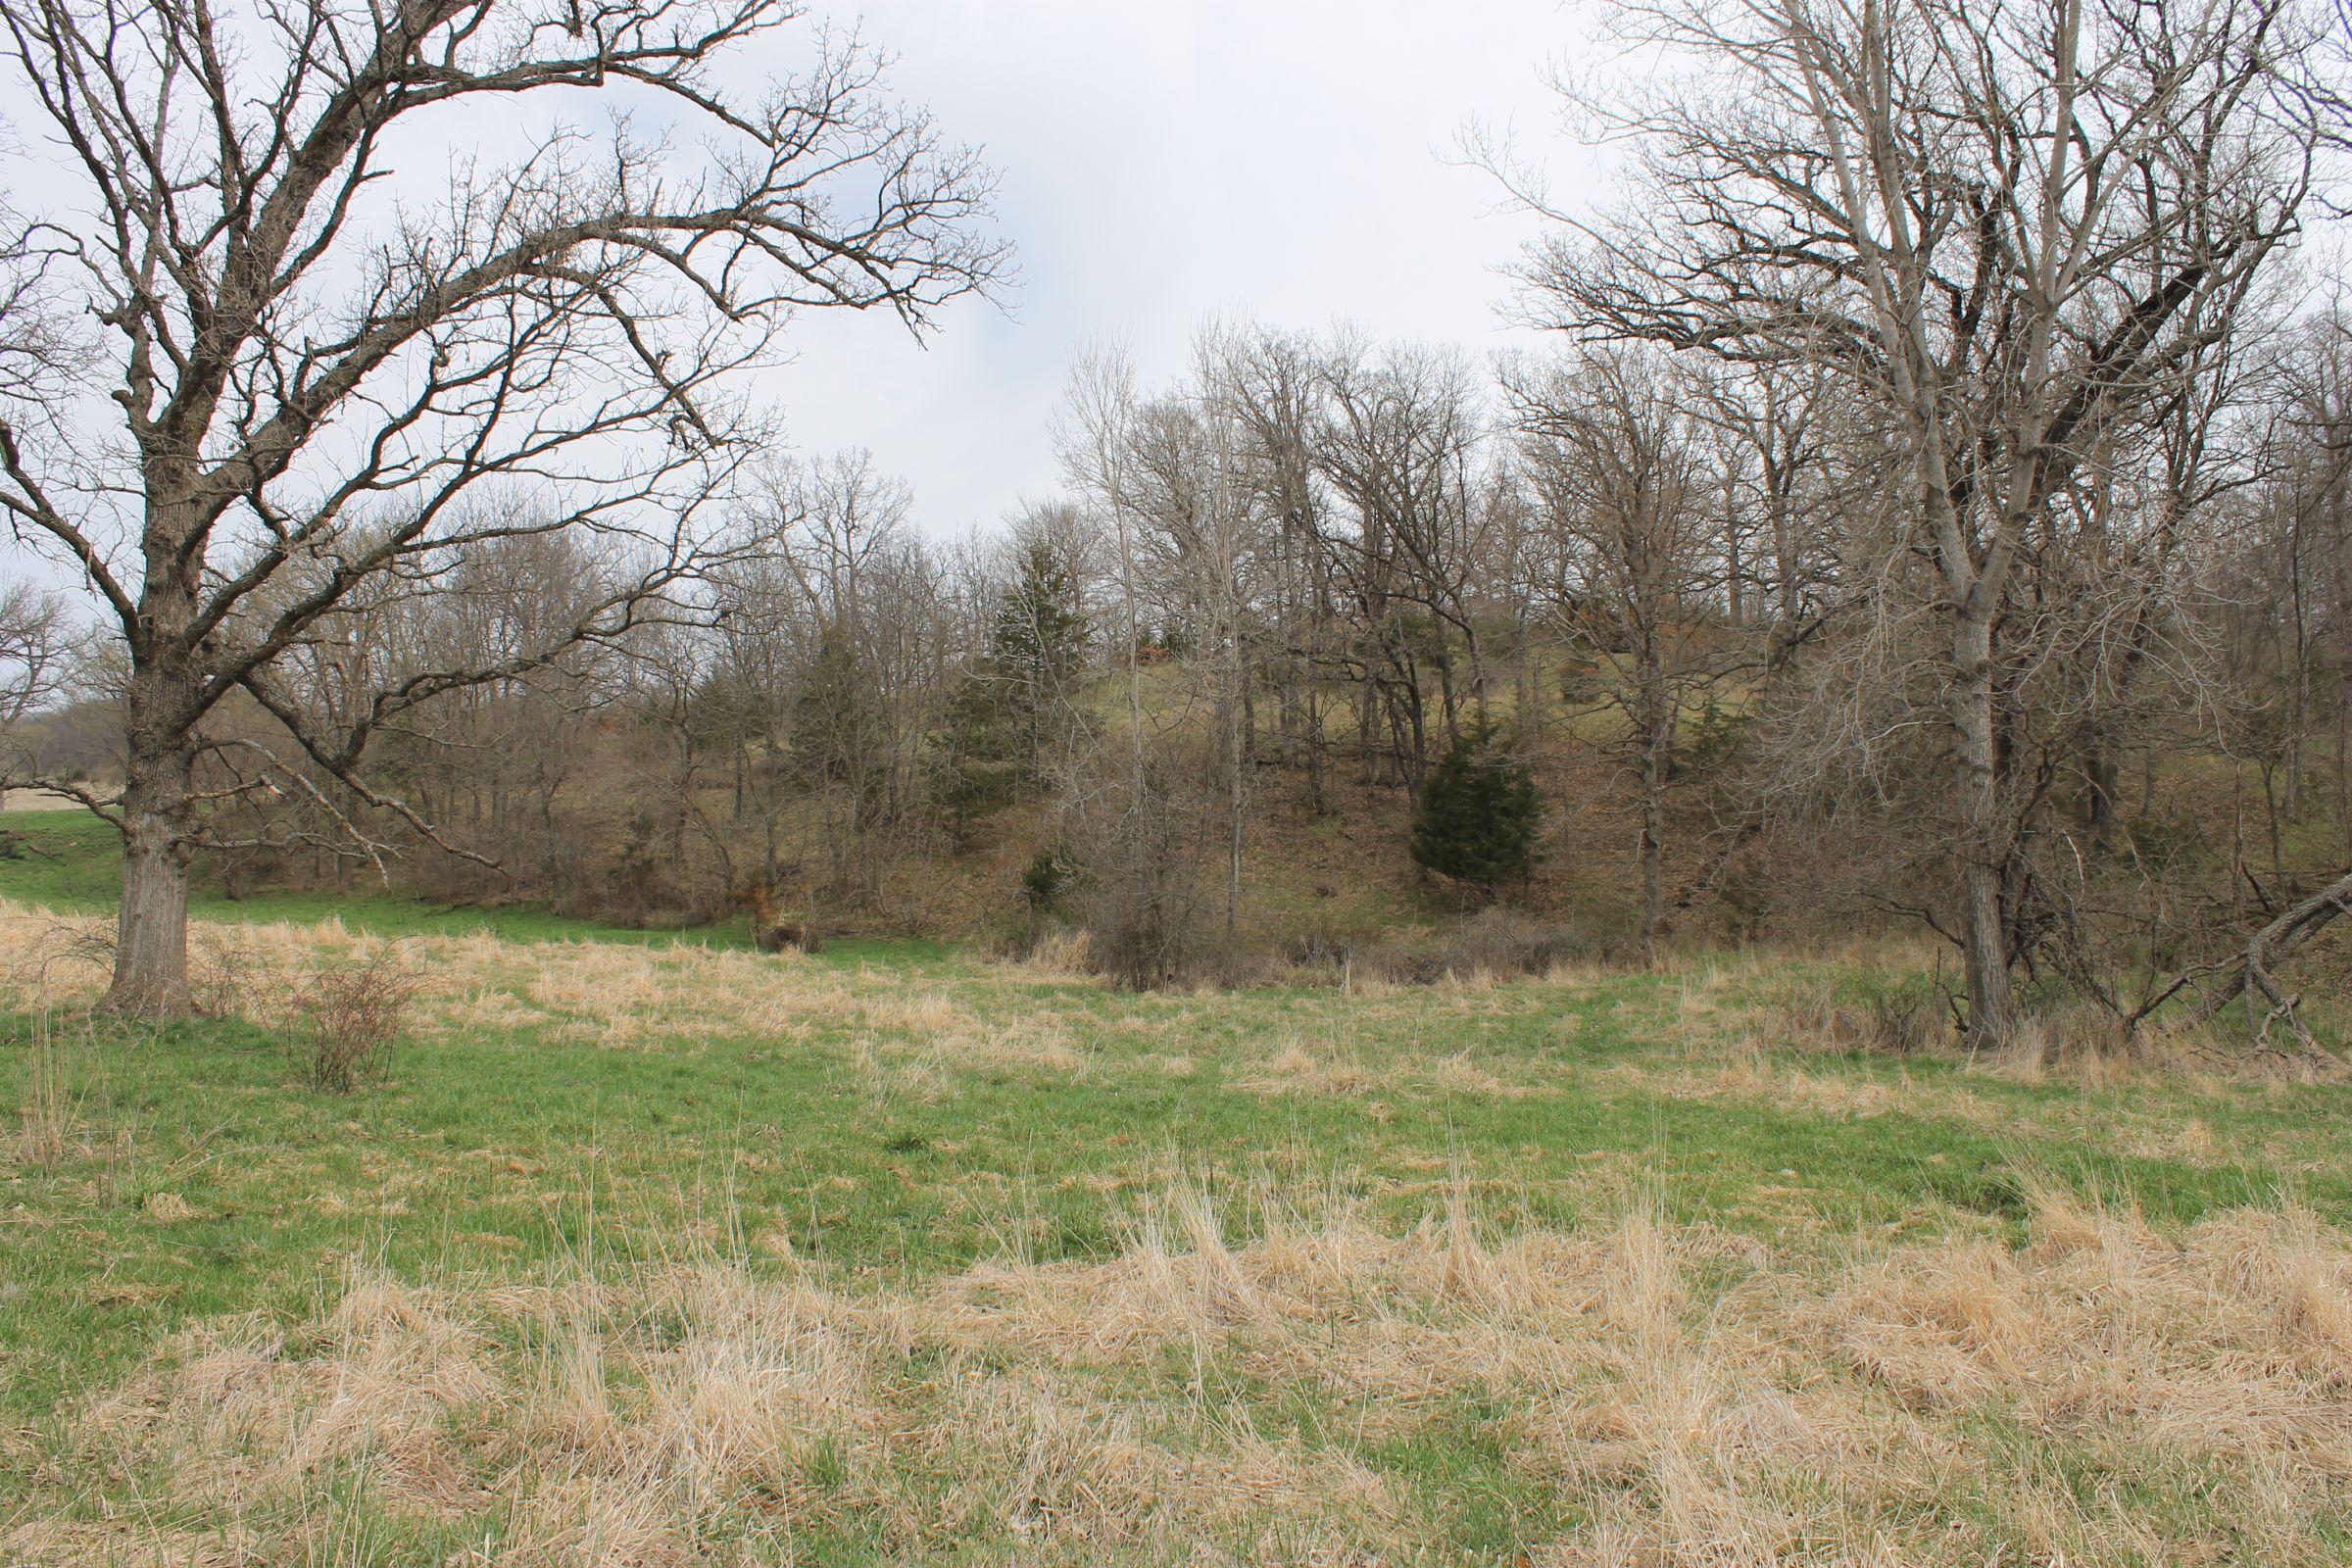 land-warren-county-iowa-71-acres-listing-number-15449-3-2021-04-09-150746.JPG